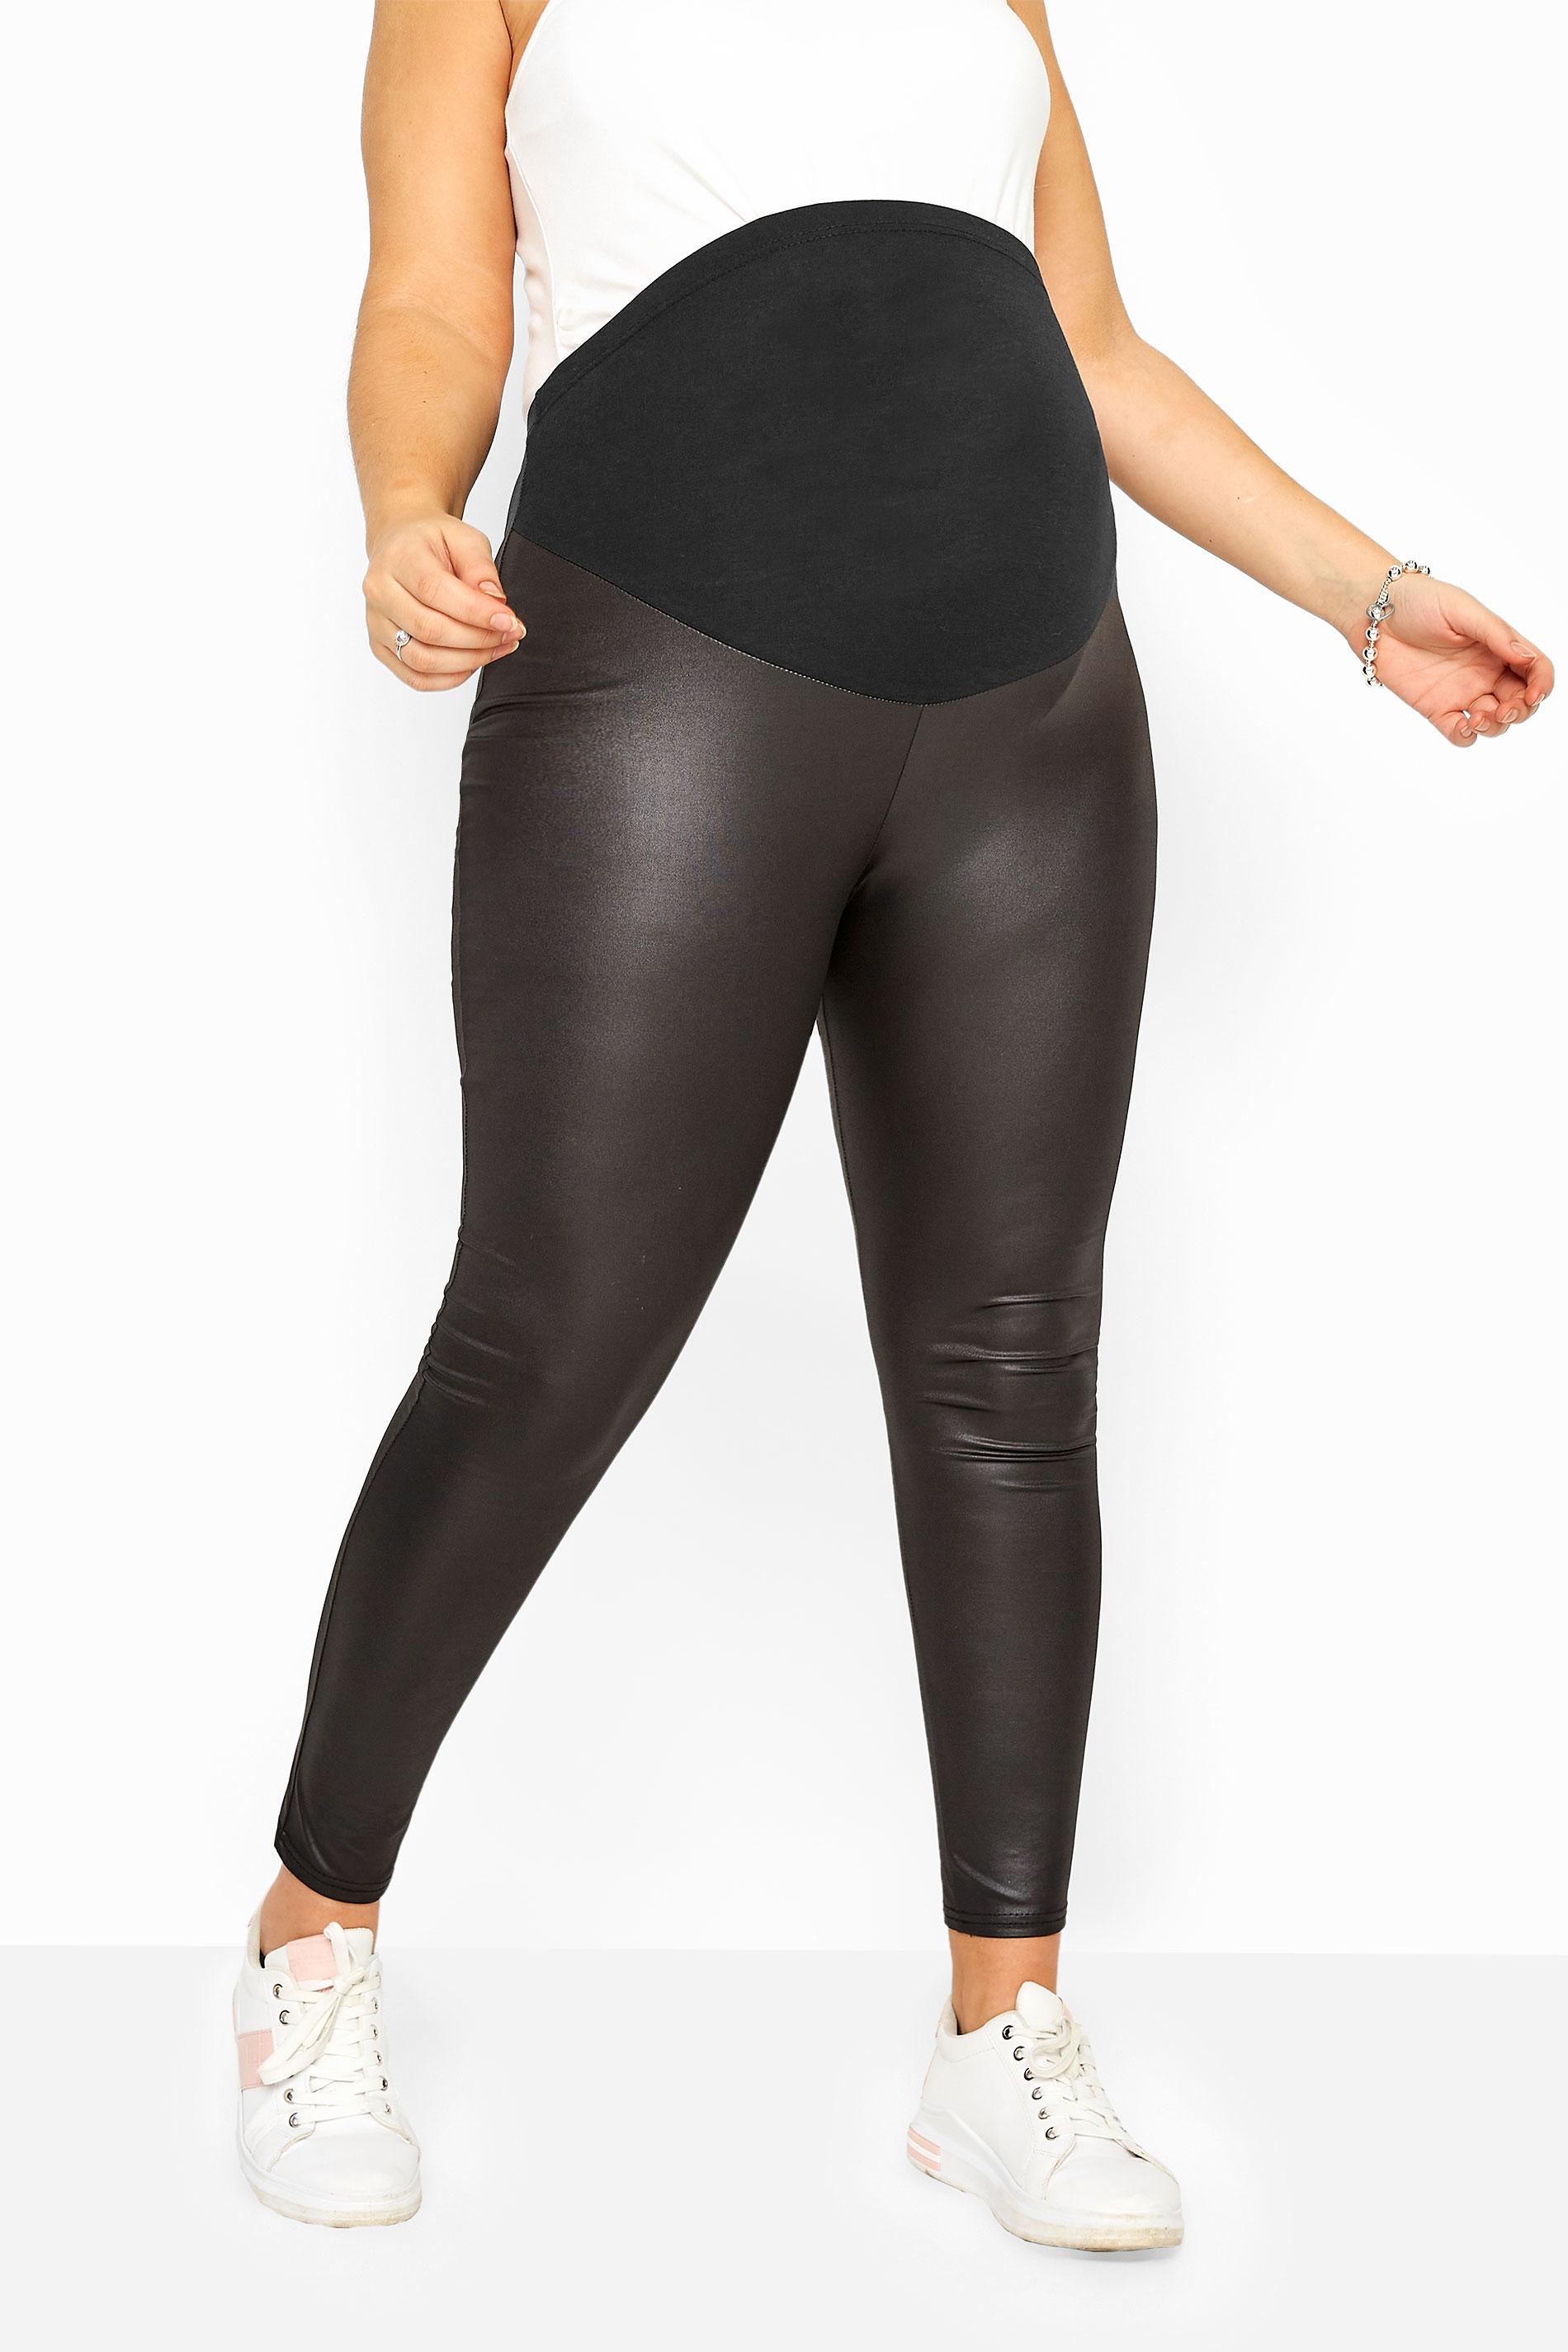 BUMP IT UP MATERNITY Black Leather Look Leggings